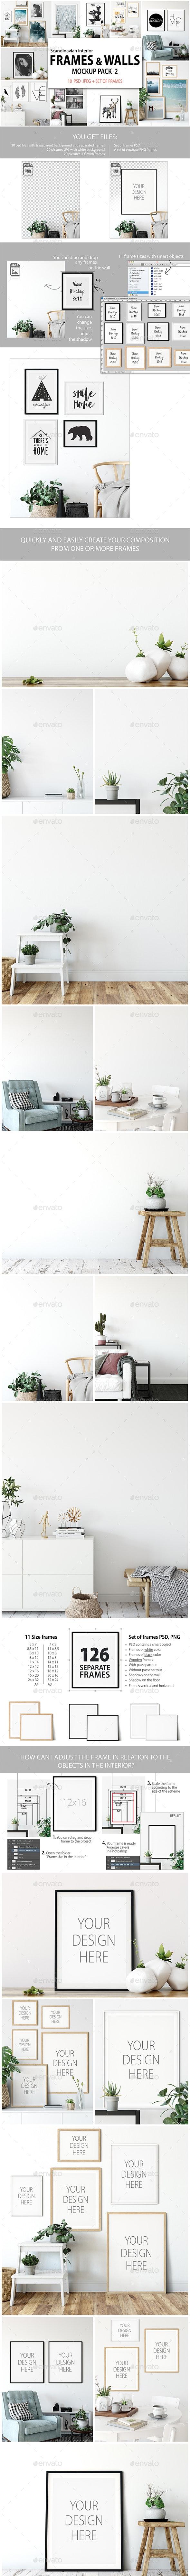 Scandinavian Interior Frames & Walls Mockup Pack - 2 - Product Mock-Ups Graphics